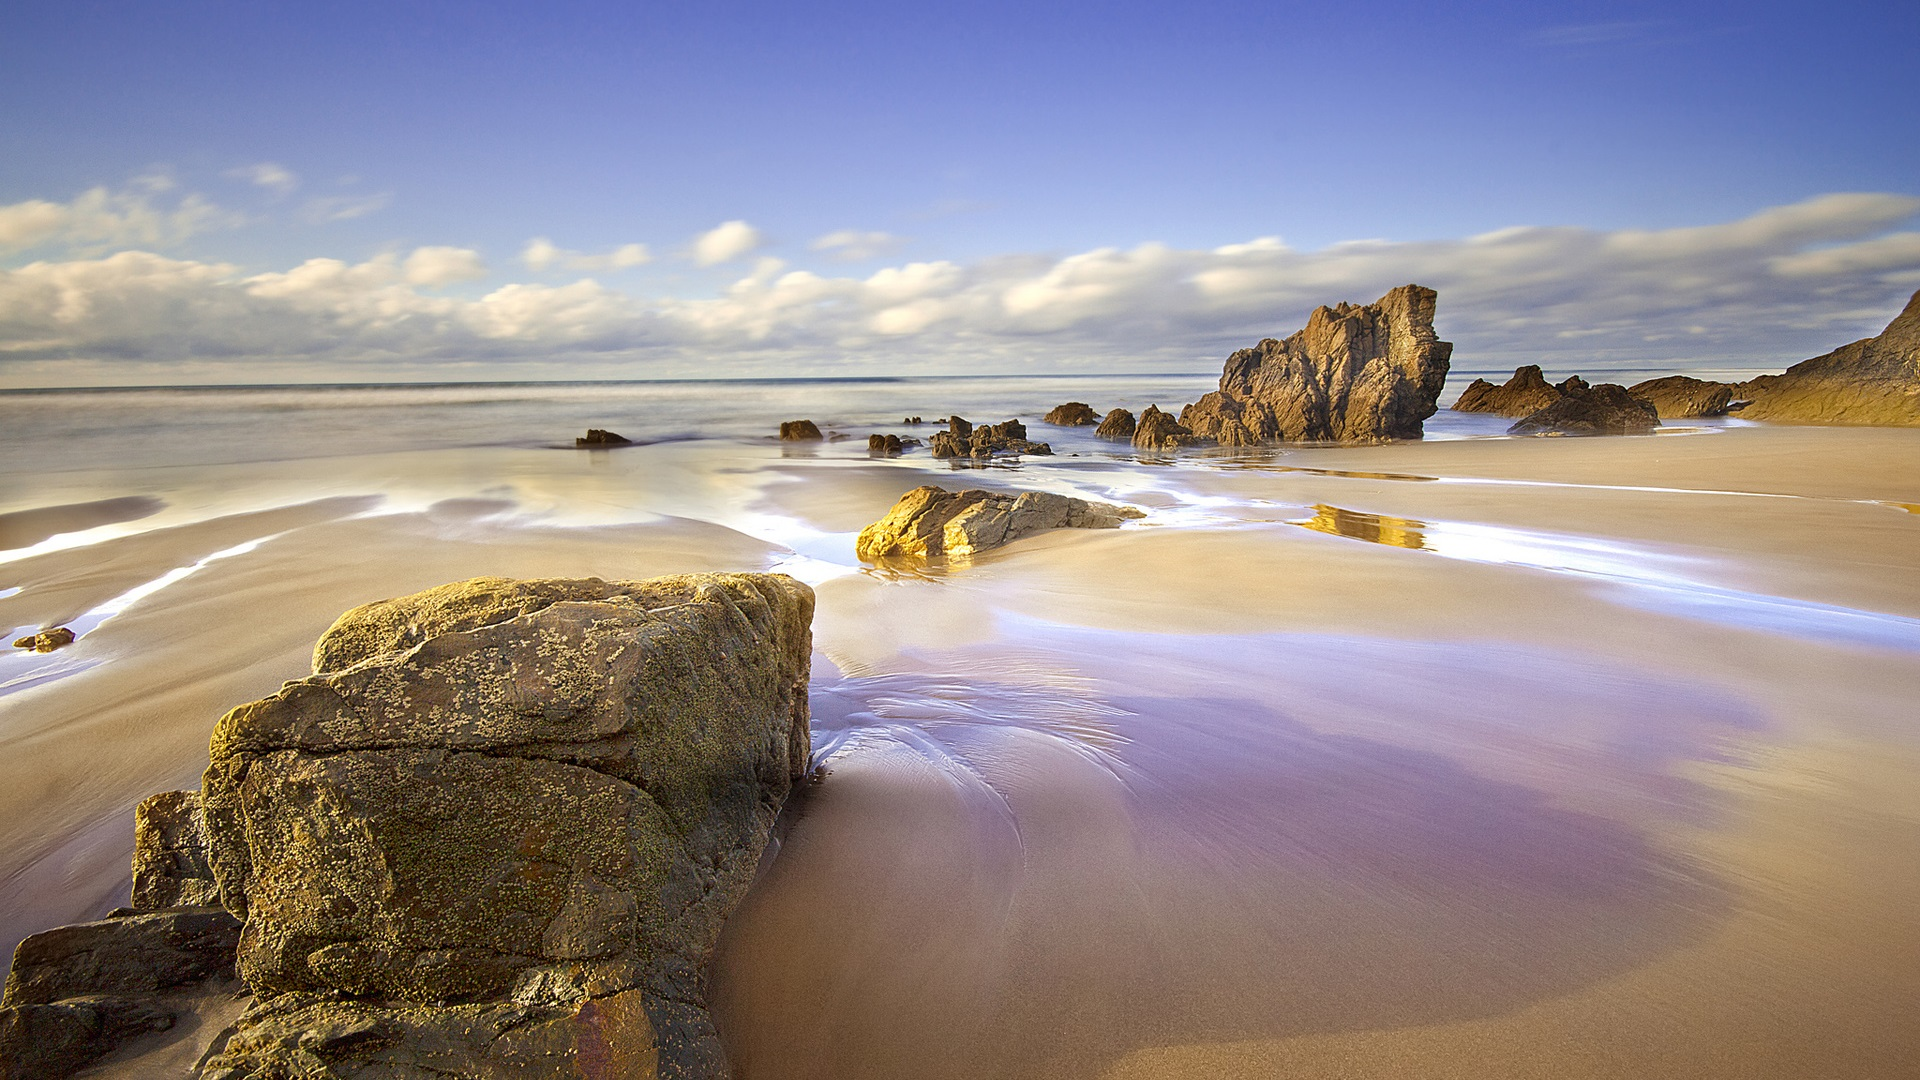 Fondo Espana Hd: Wallpaper Spain, Asturias, Beach, Sea, Rocks 1920x1200 HD